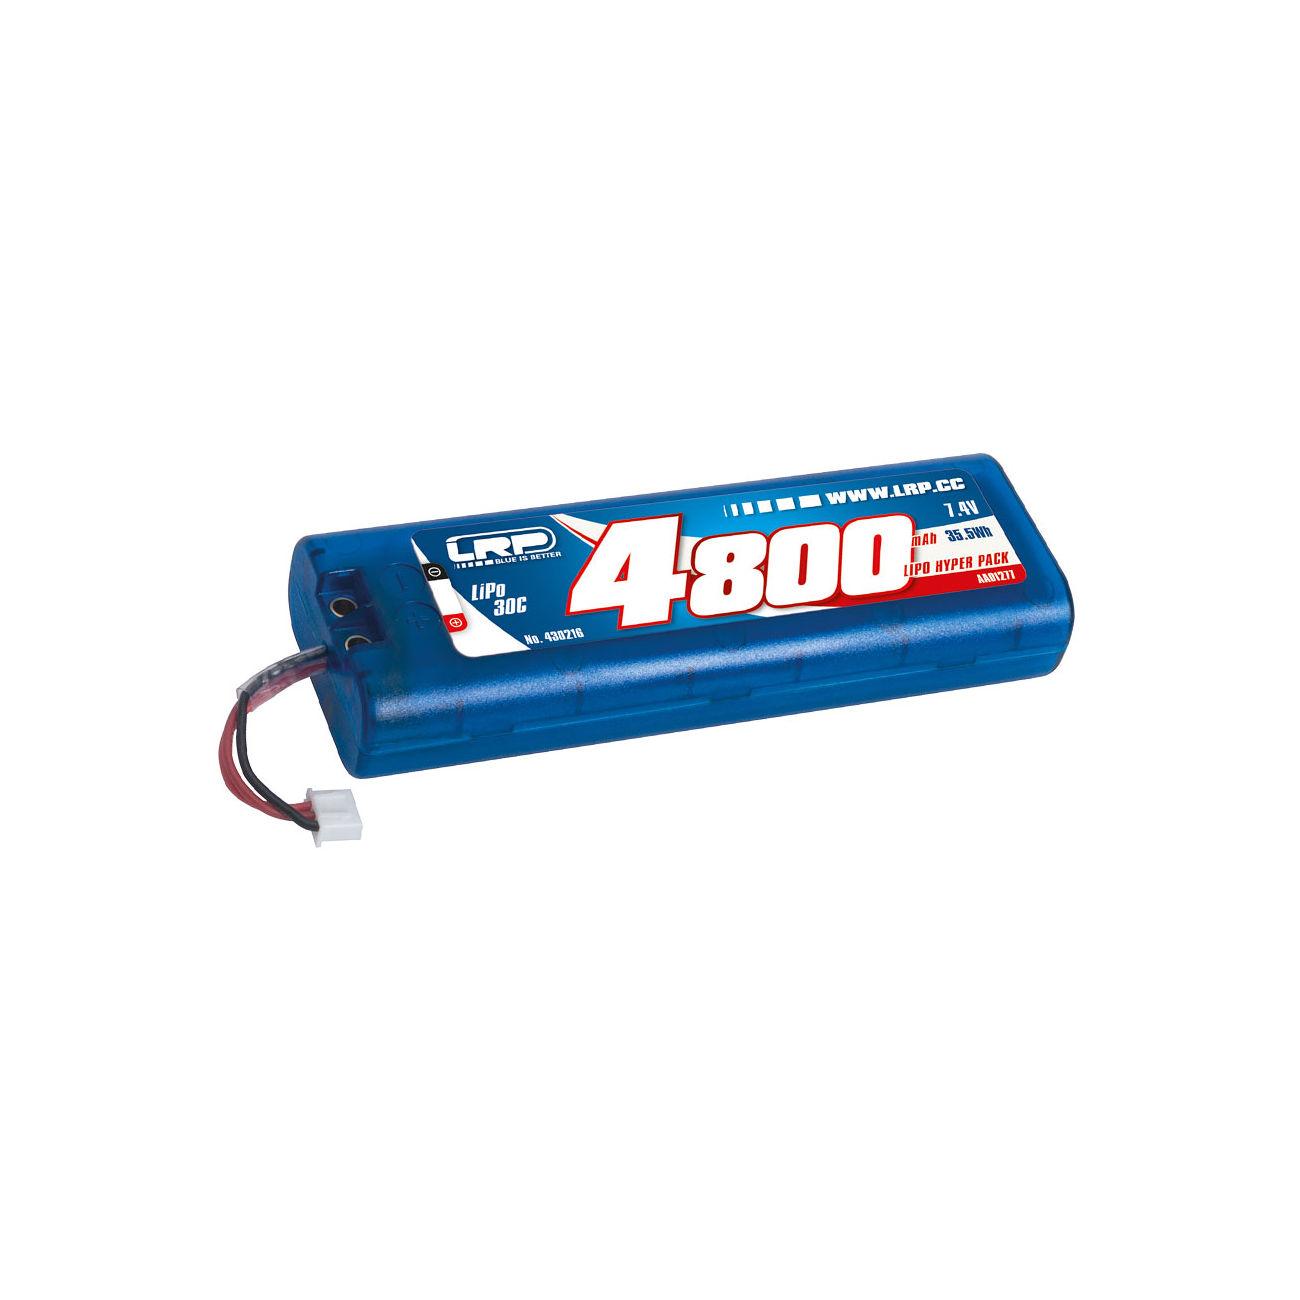 Lrp lipo akku 7 4v 4800mah 30c hyper pack multi plug for Lipo schreibtisch